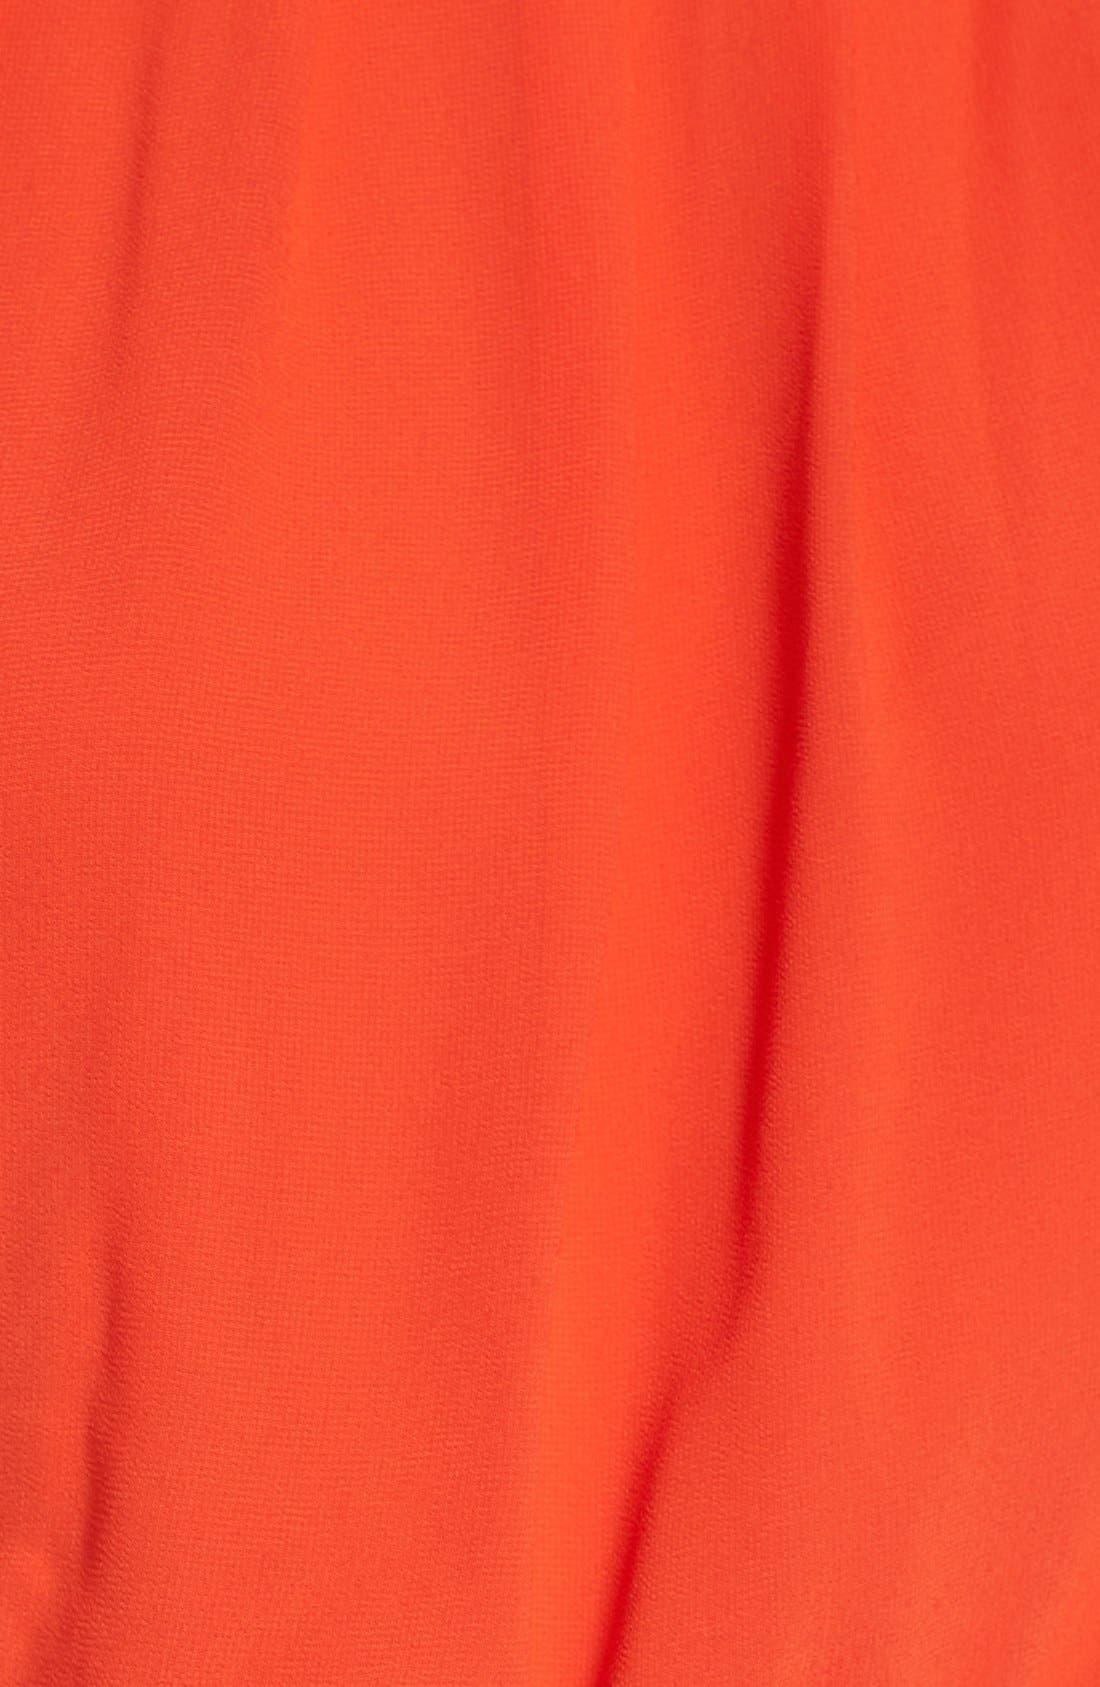 Blouson Chiffon Skater Dress,                             Alternate thumbnail 221, color,